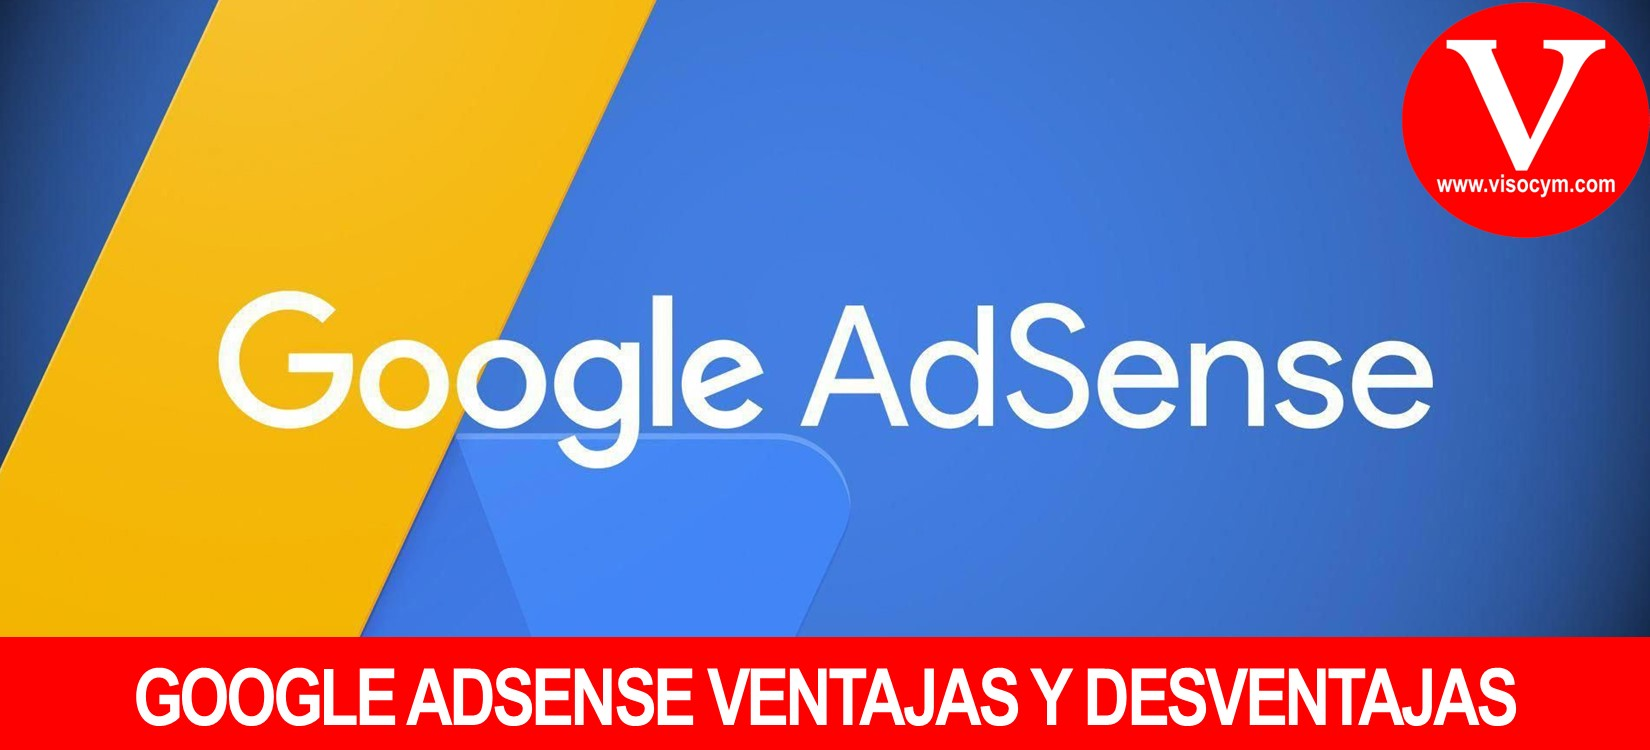 ventajas y desventajas de google adsense